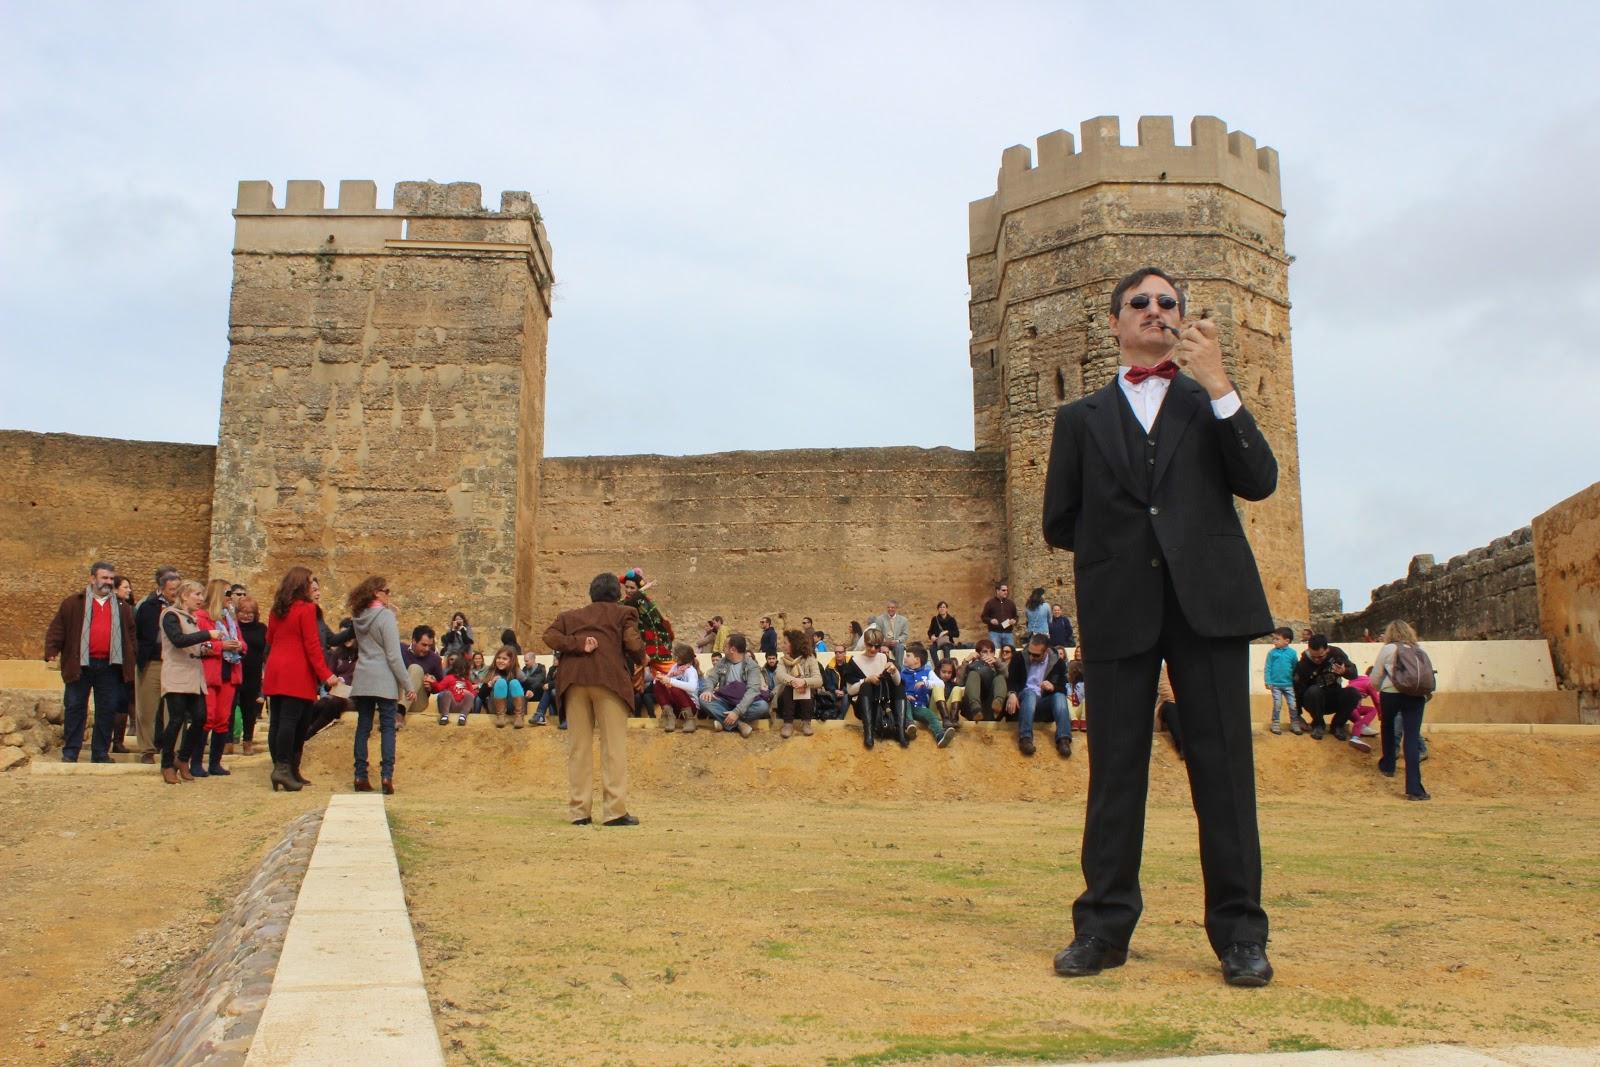 Alcalamegusta nuevo espect culo en el castillo de alcal - Comisaria alcala de guadaira ...